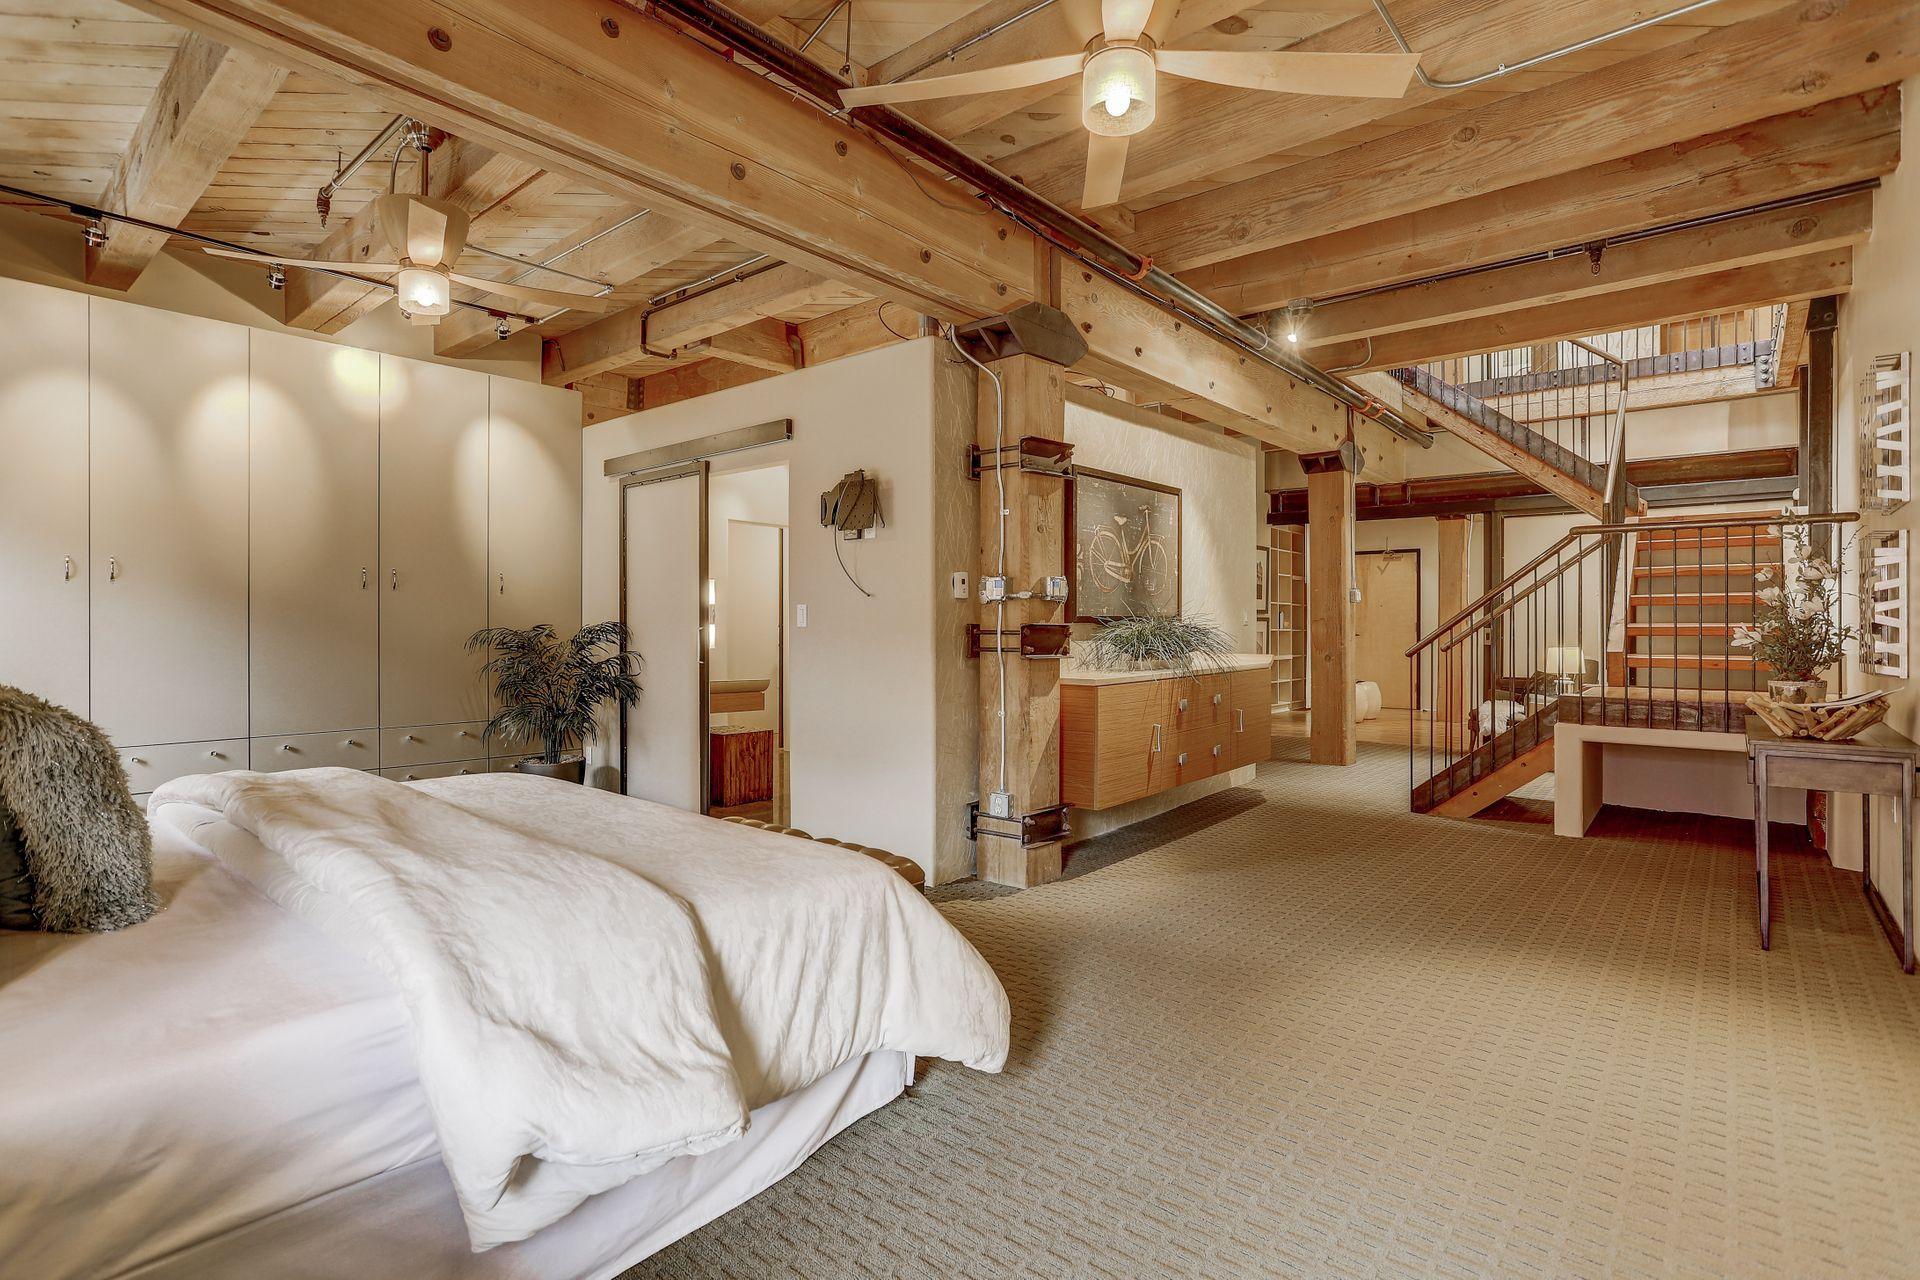 1792 Wynkoop Street, #502 room